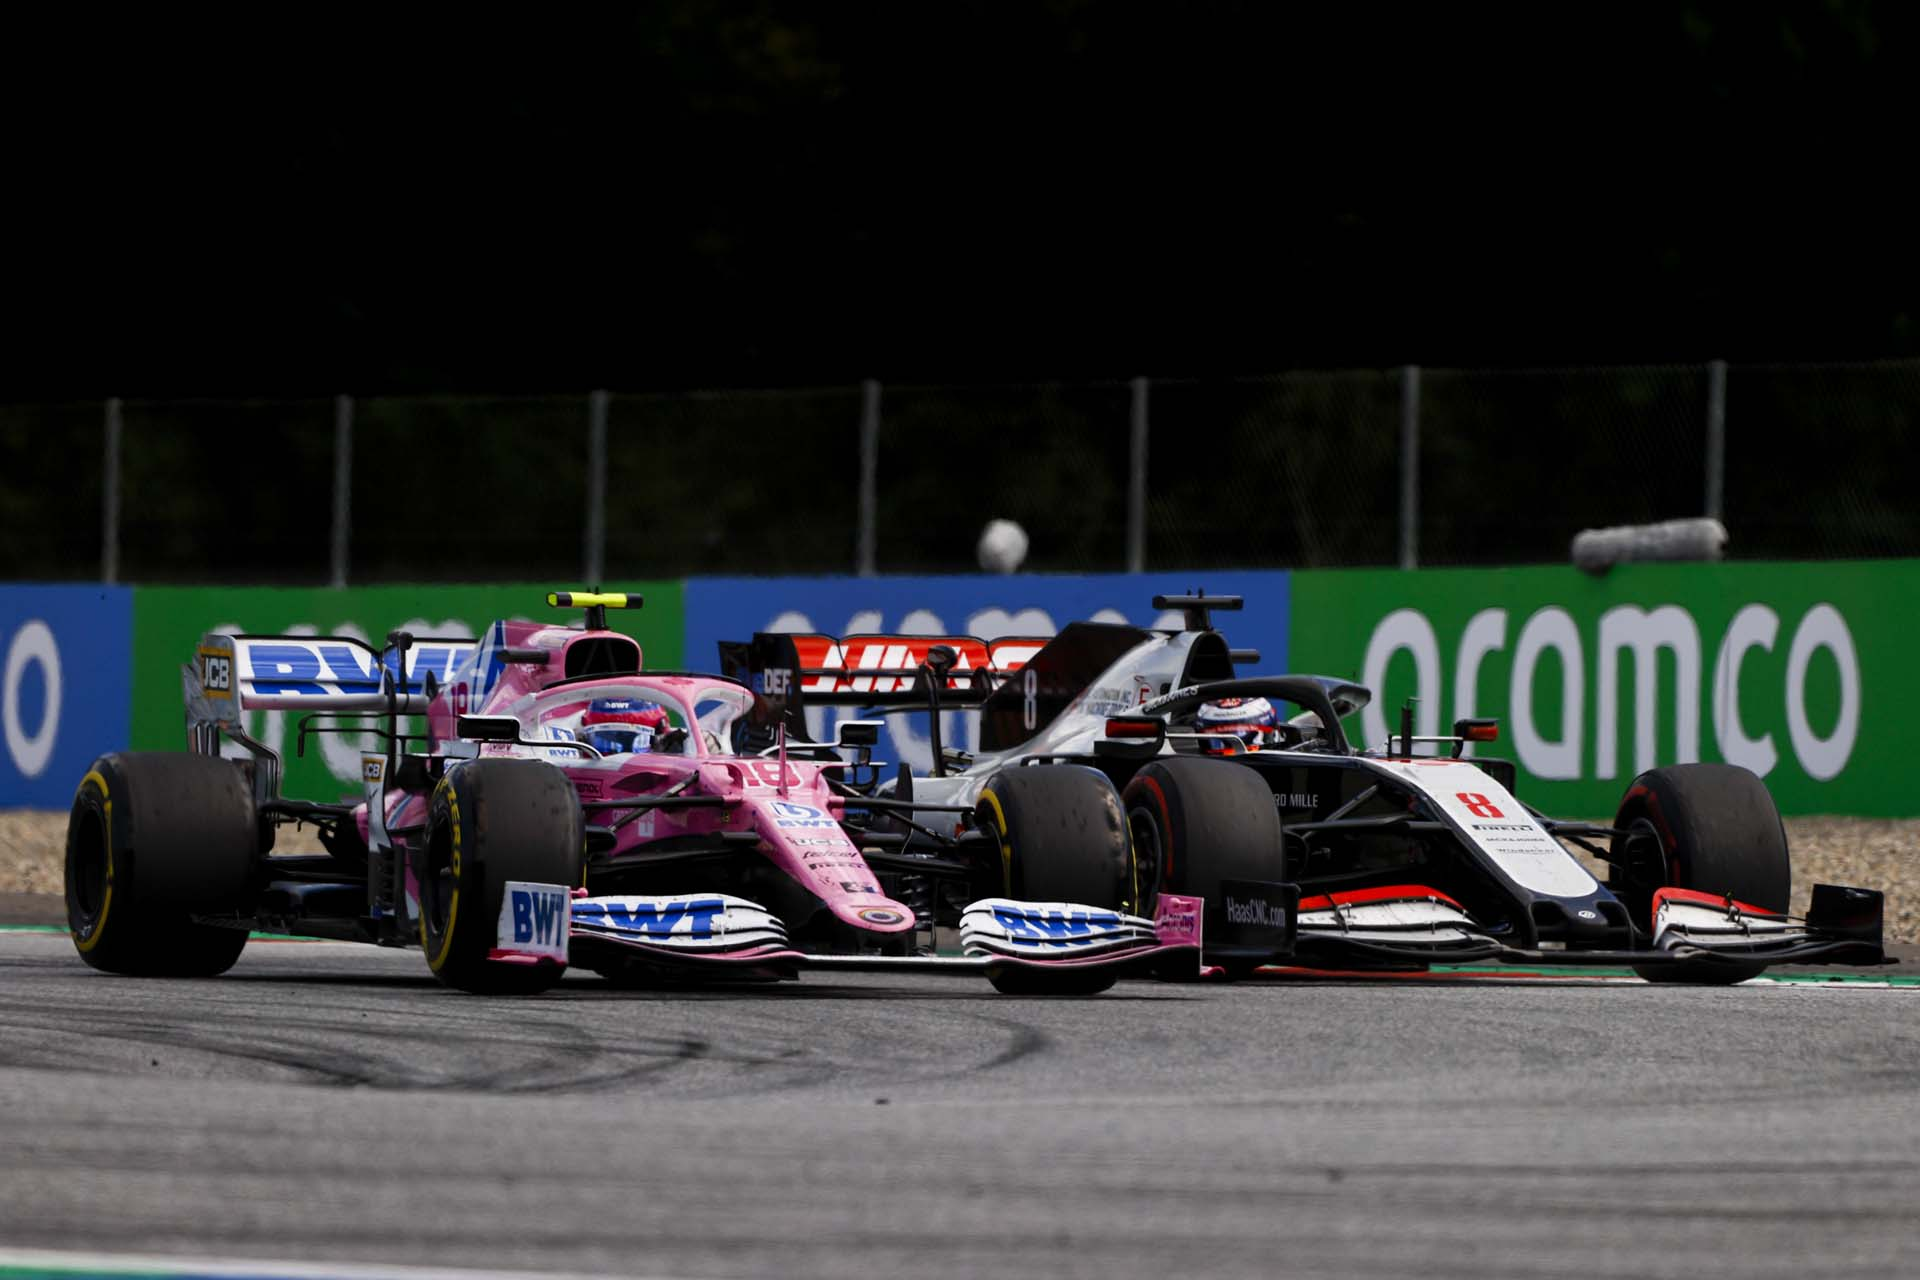 Lance Stroll, Racing Point RP20 and Romain Grosjean, Haas VF-20 battle